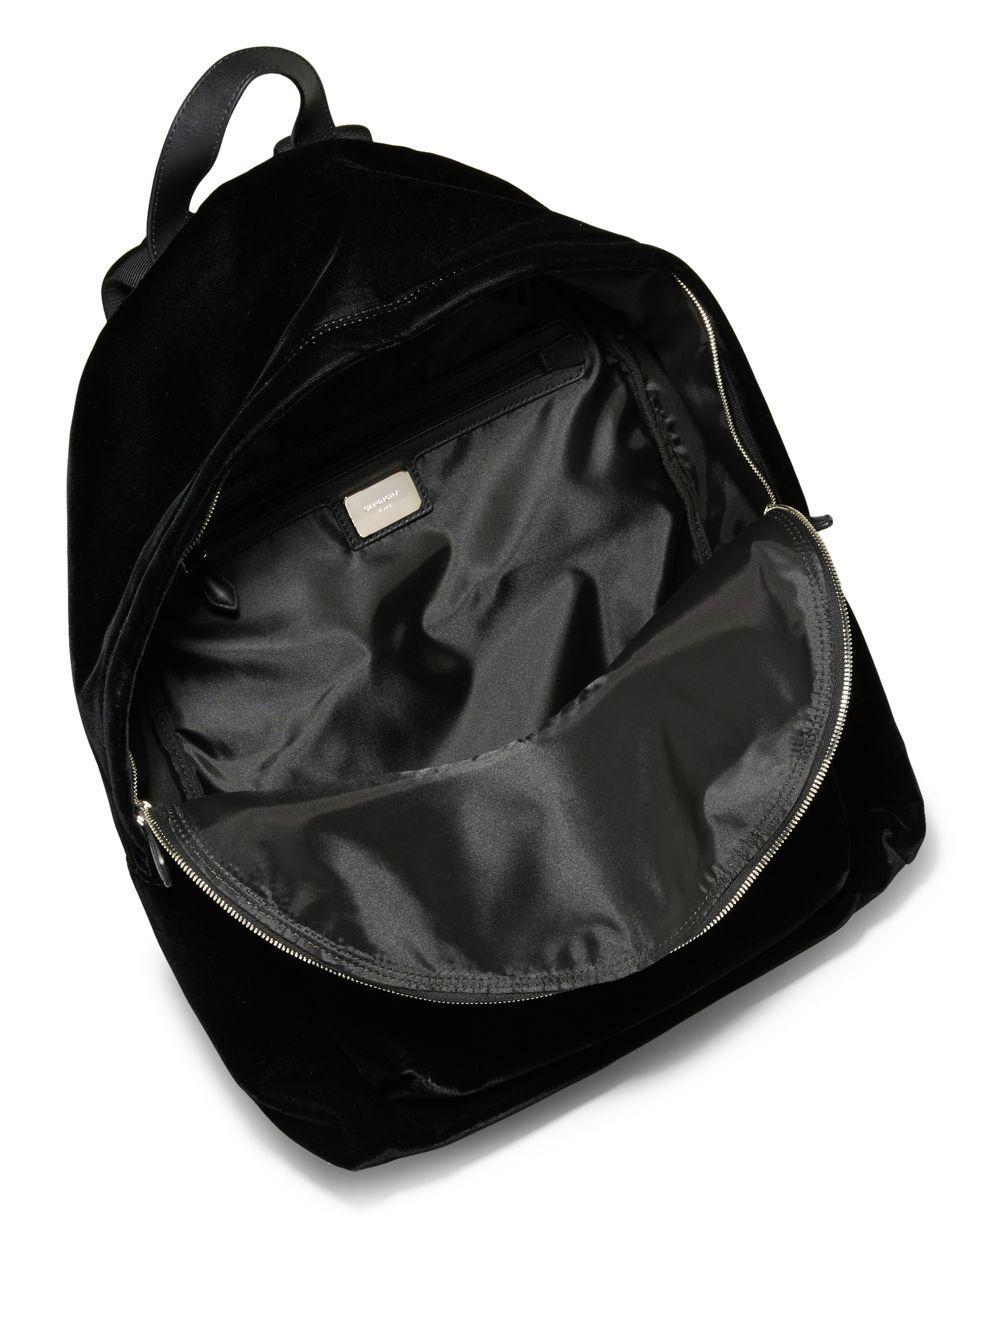 6e16d0fe80 Lyst - Givenchy Solid Backpack in Black for Men